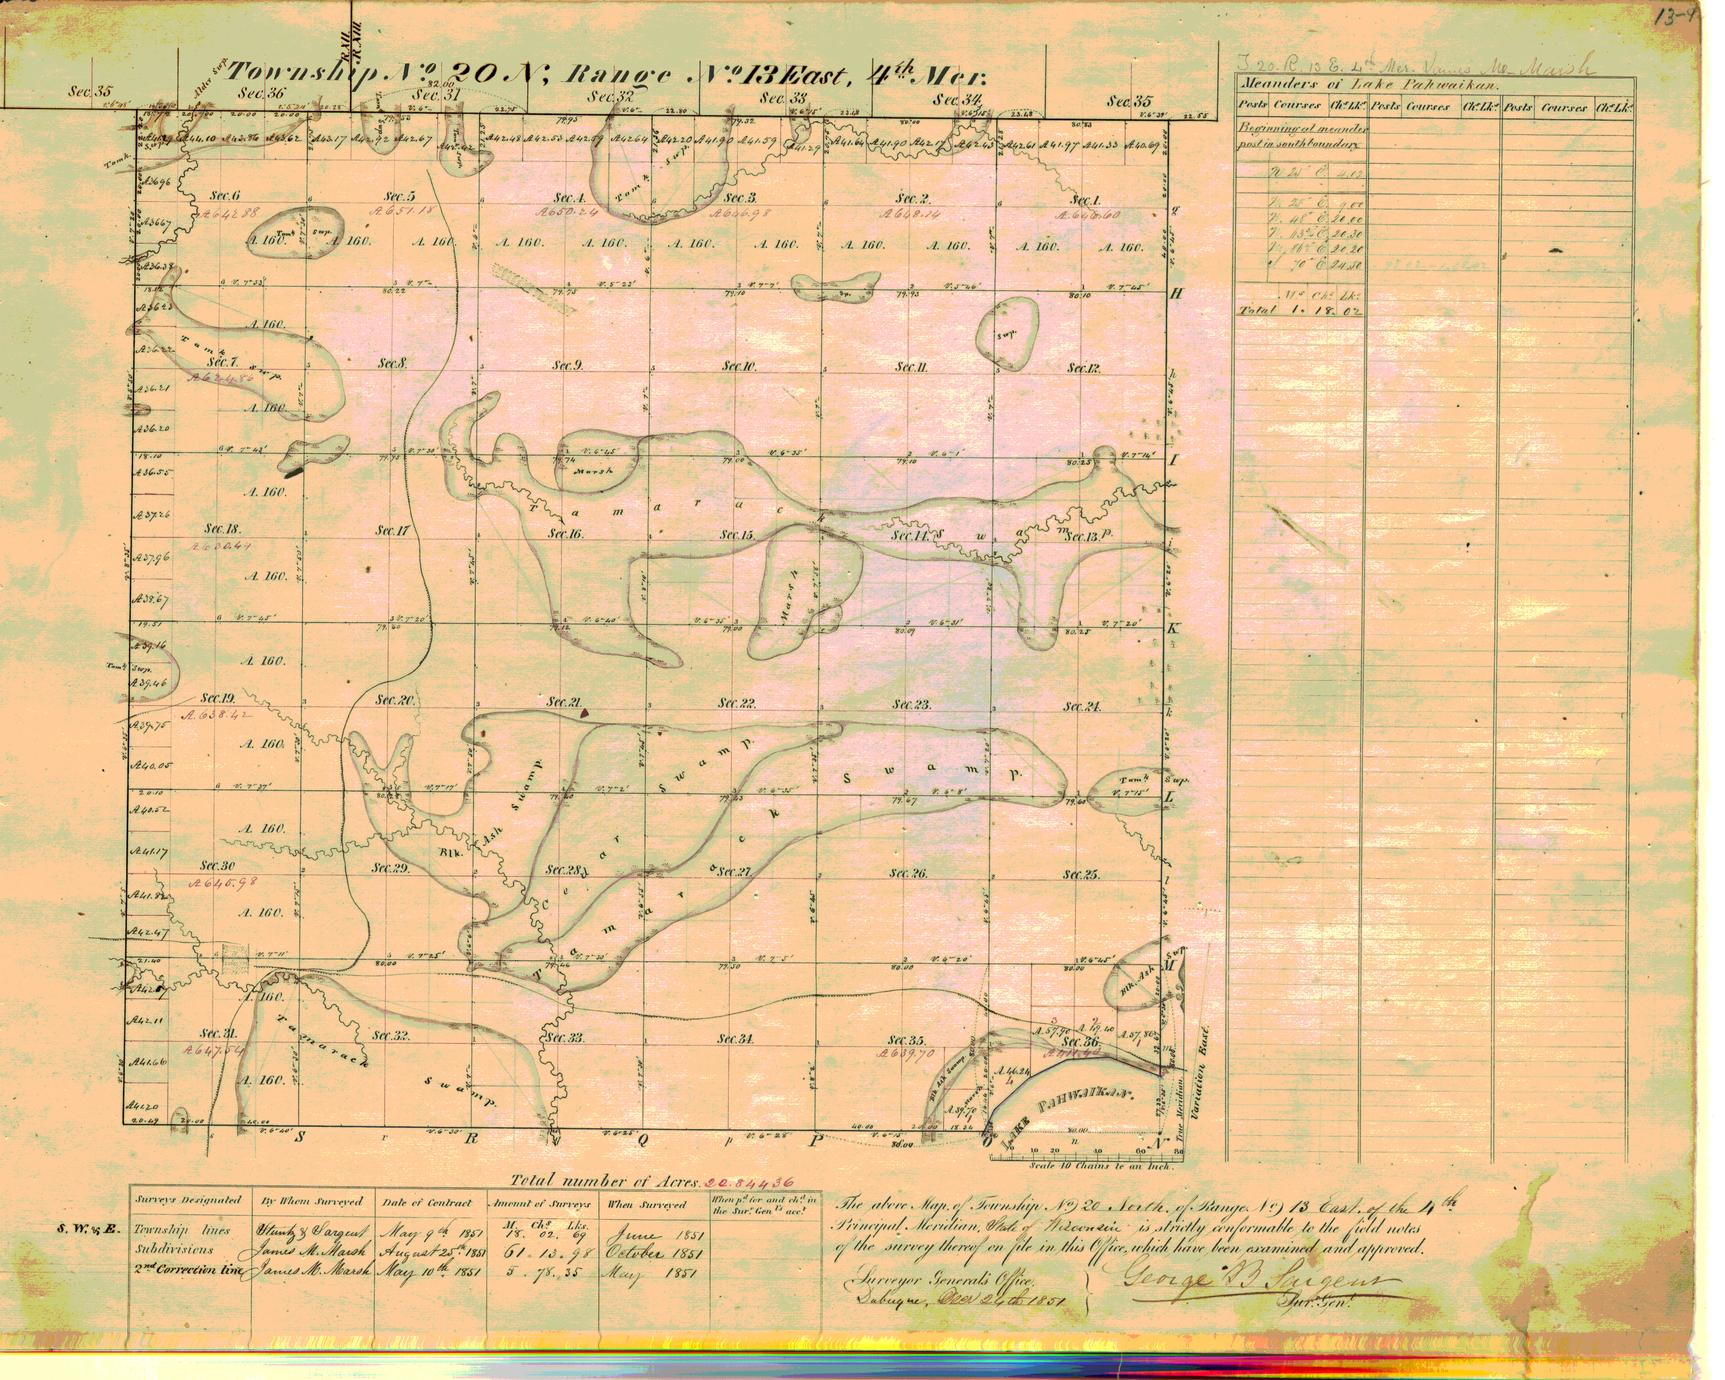 [Public Land Survey System map: Wisconsin Township 20 North, Range 13 East]